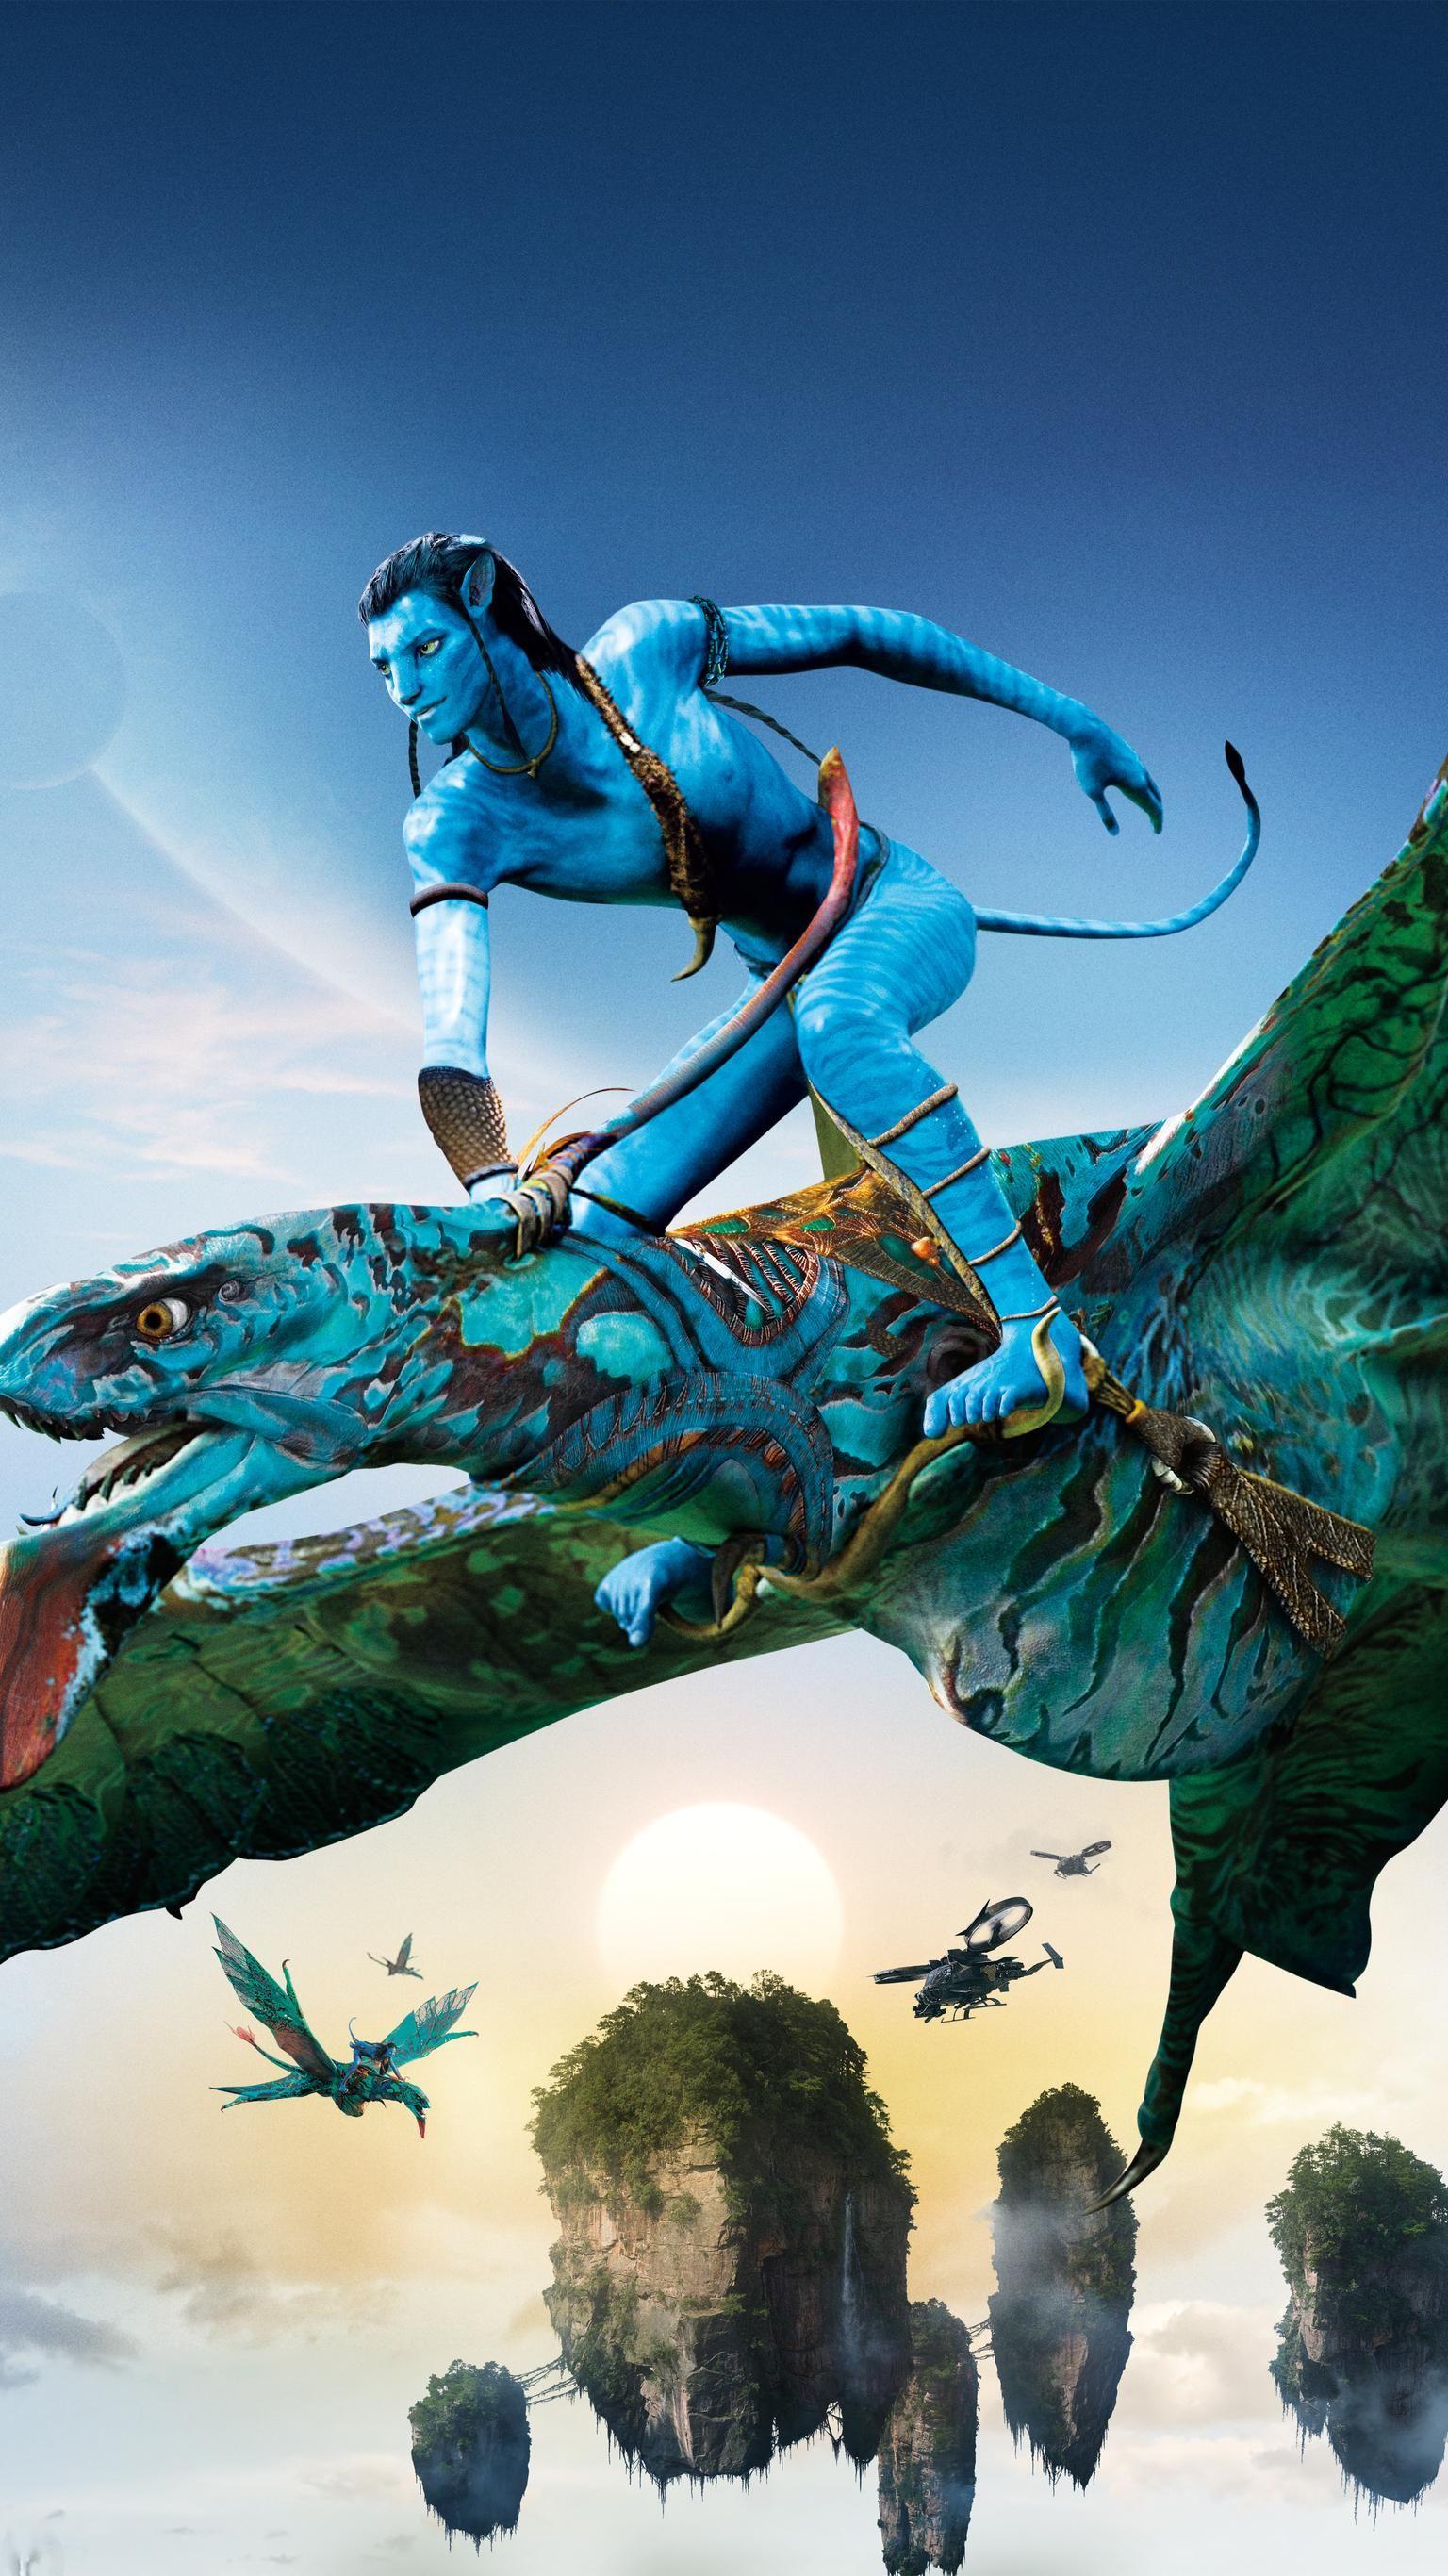 Avatar 2009 Phone Wallpaper In 2020 Avatar Movie Avatar Phone Wallpaper